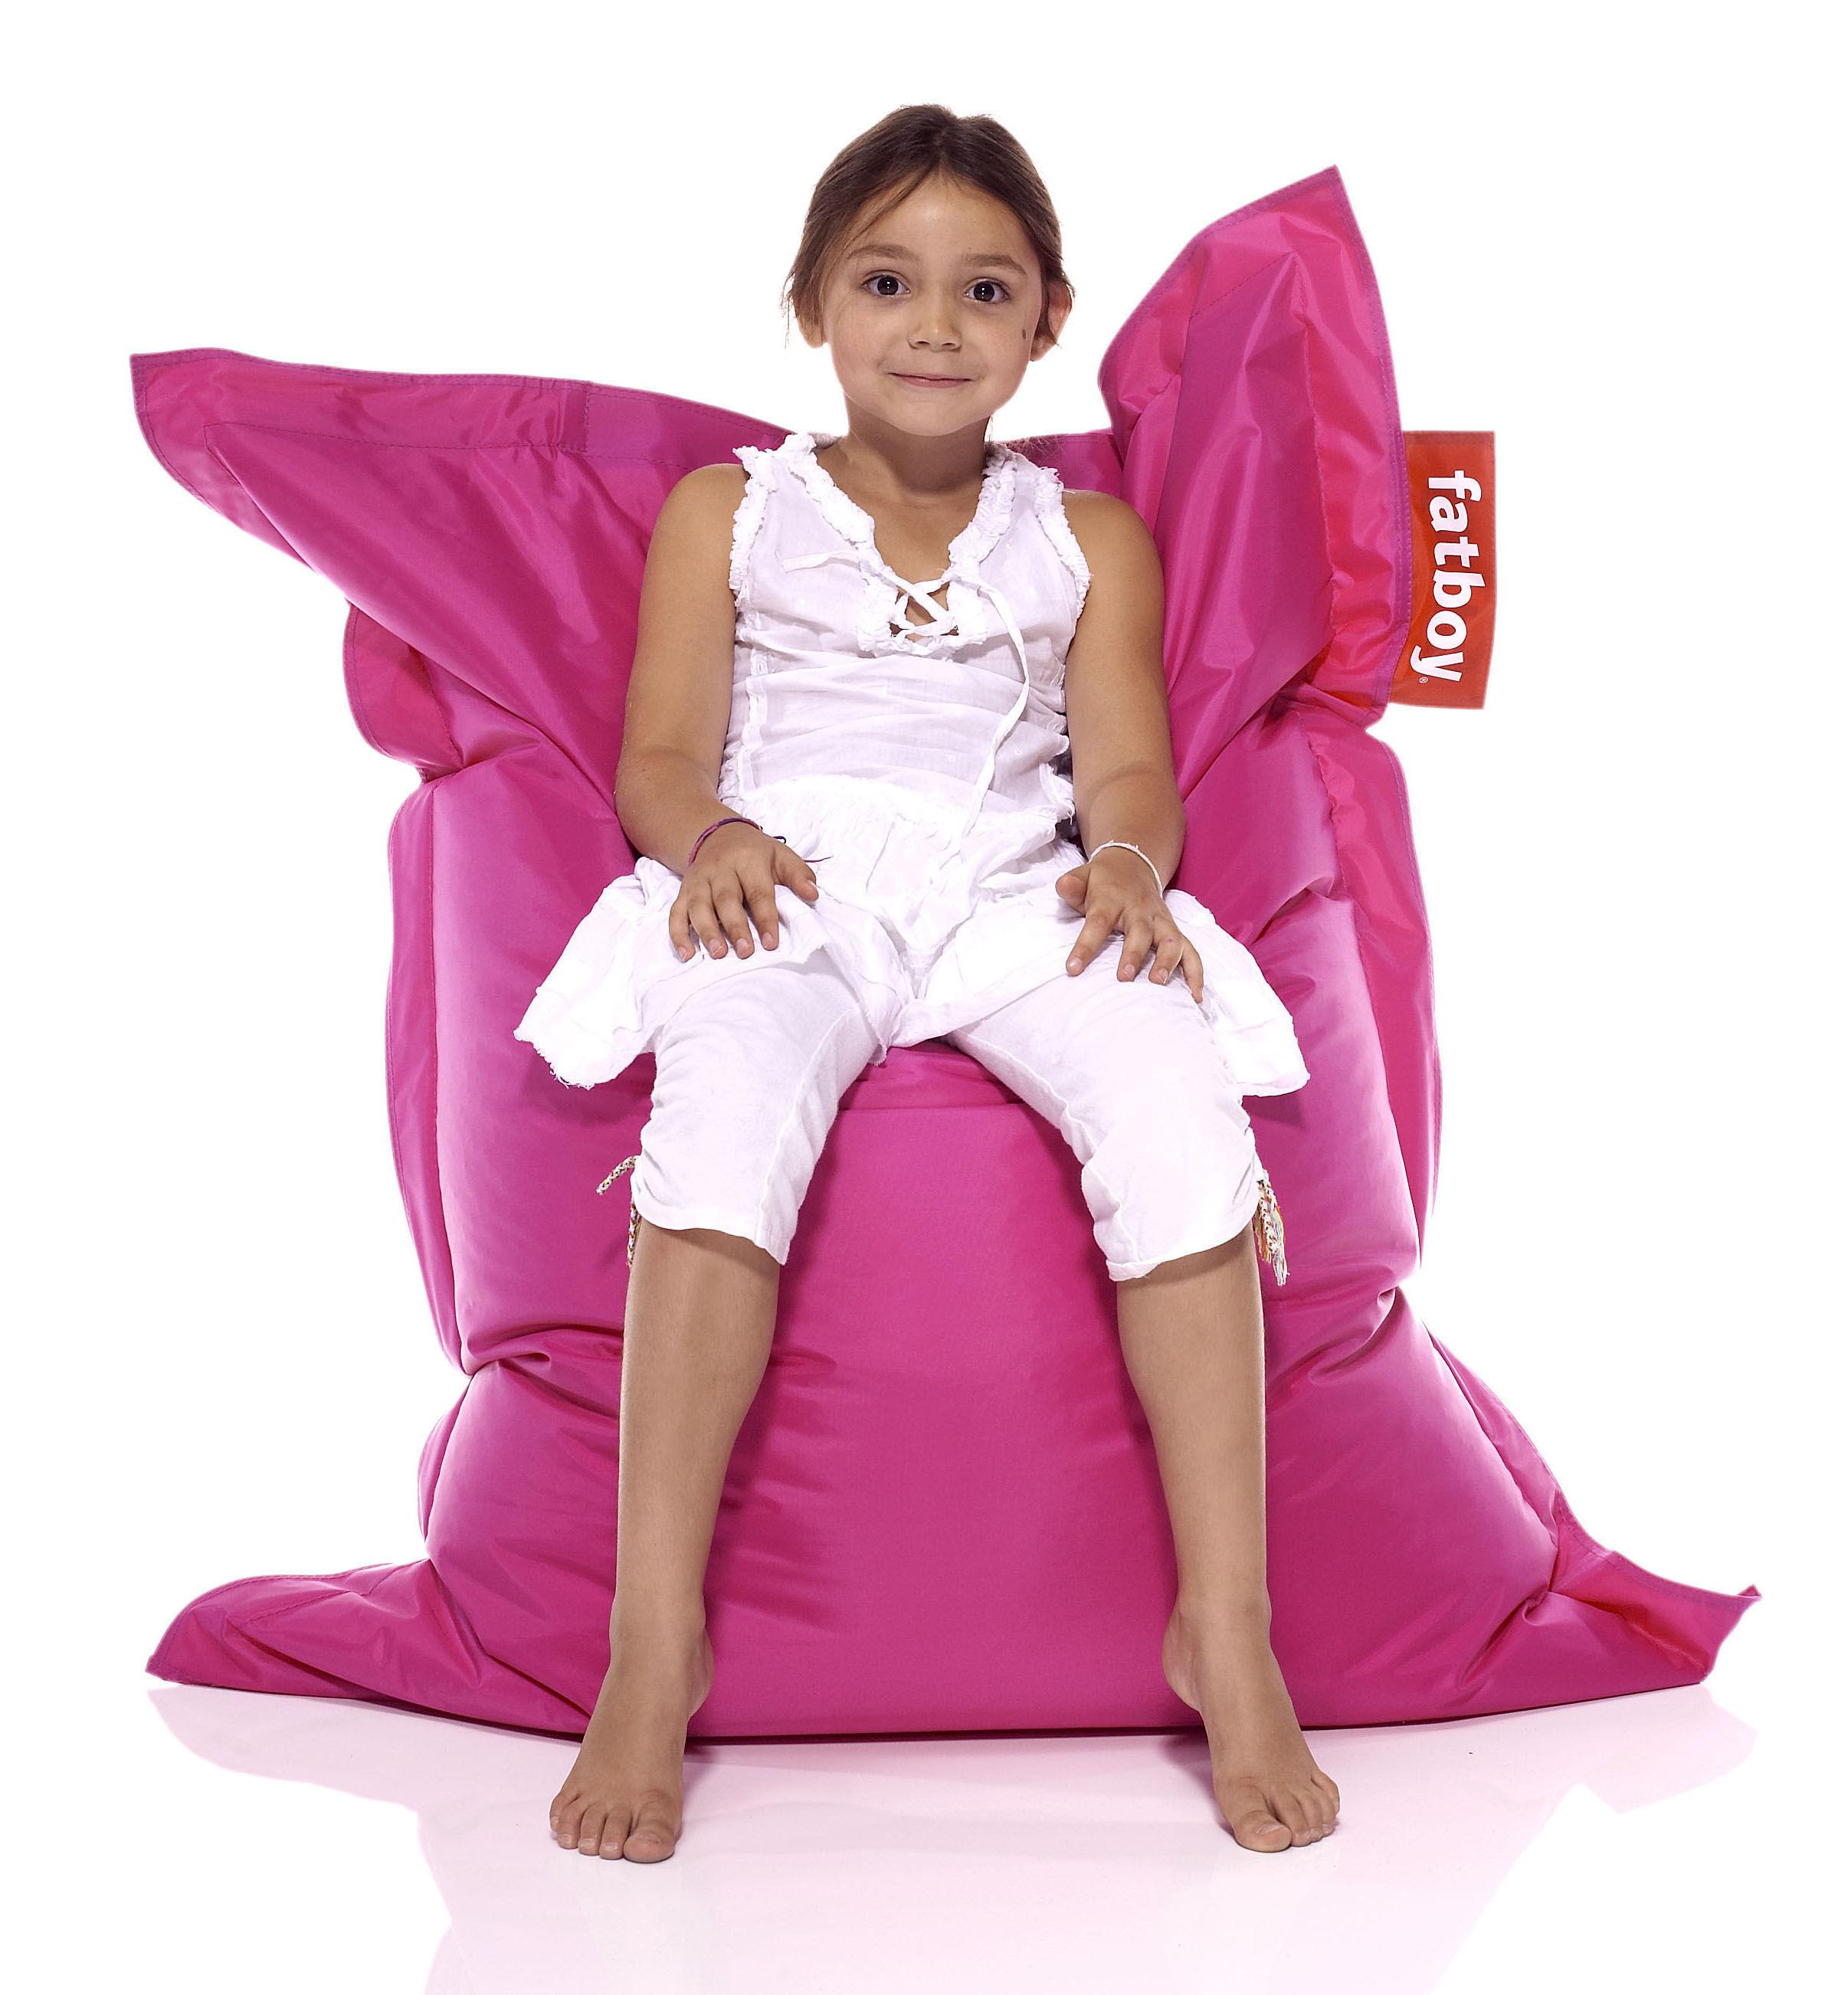 junior fatboy sitzkissen f r kinder. Black Bedroom Furniture Sets. Home Design Ideas